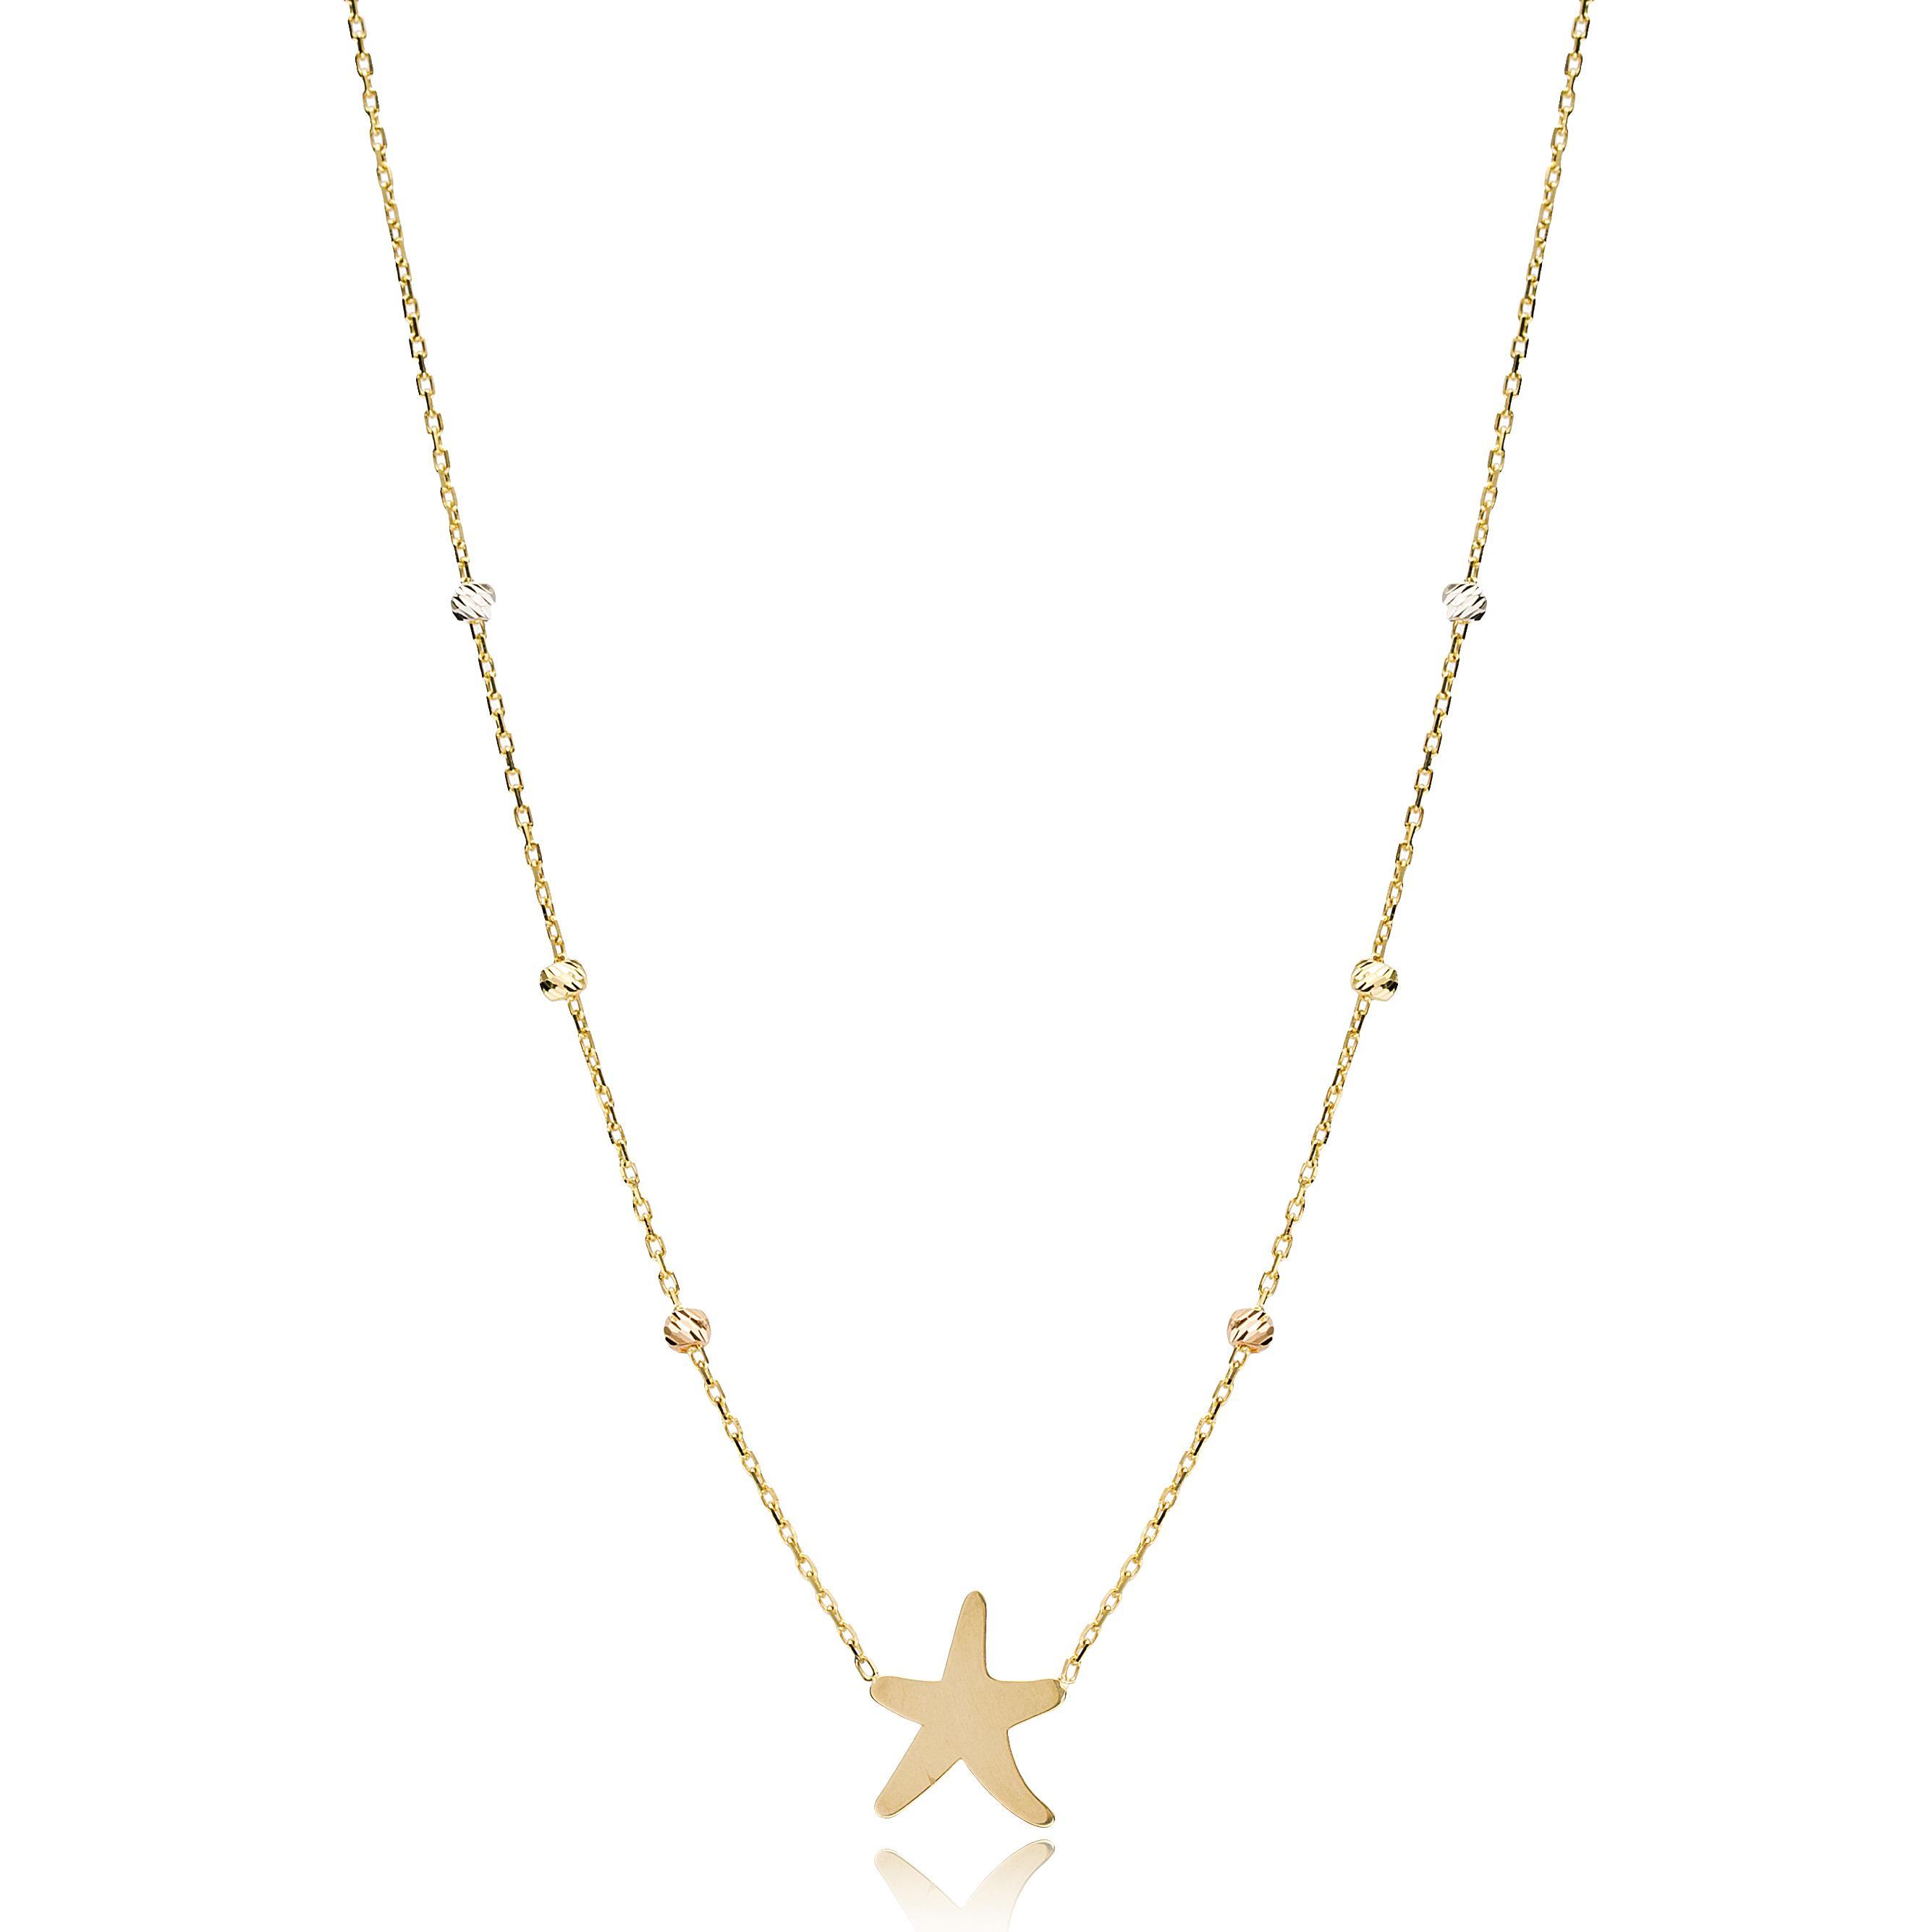 Starfish Charm Necklace Wholesale Handmade Turkish 14K Jewelry